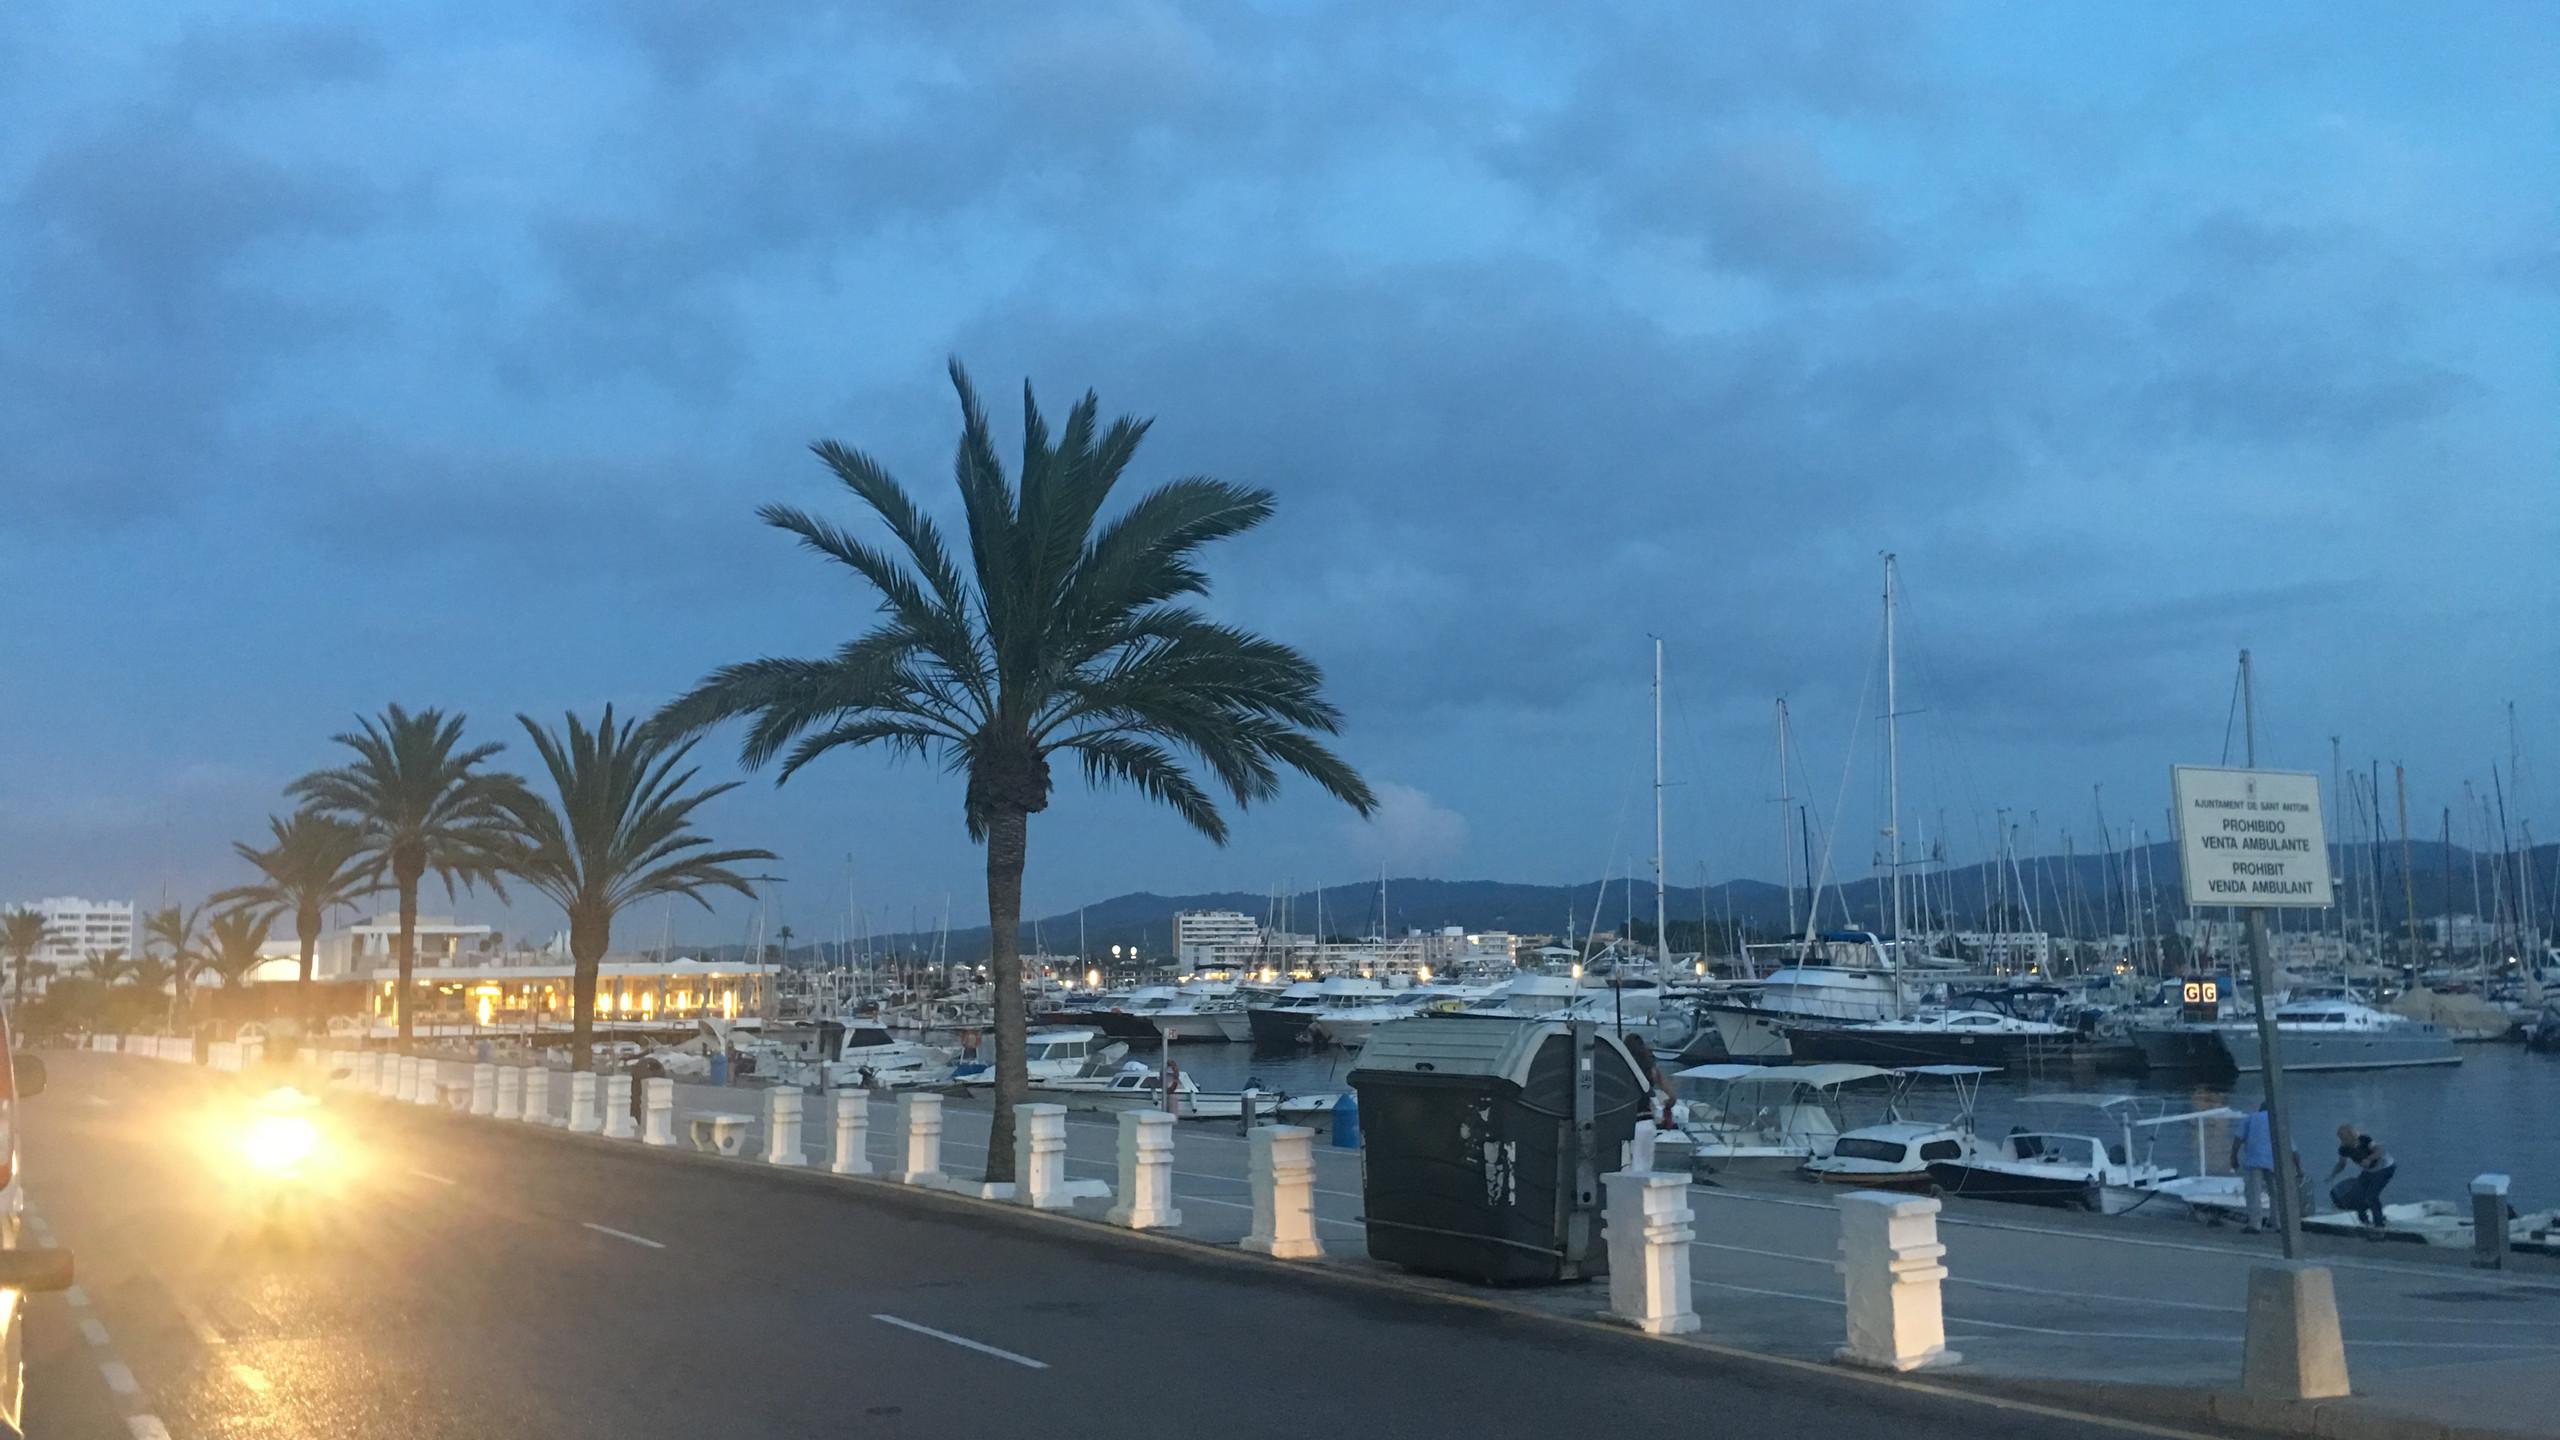 Evening view (Ibiza)